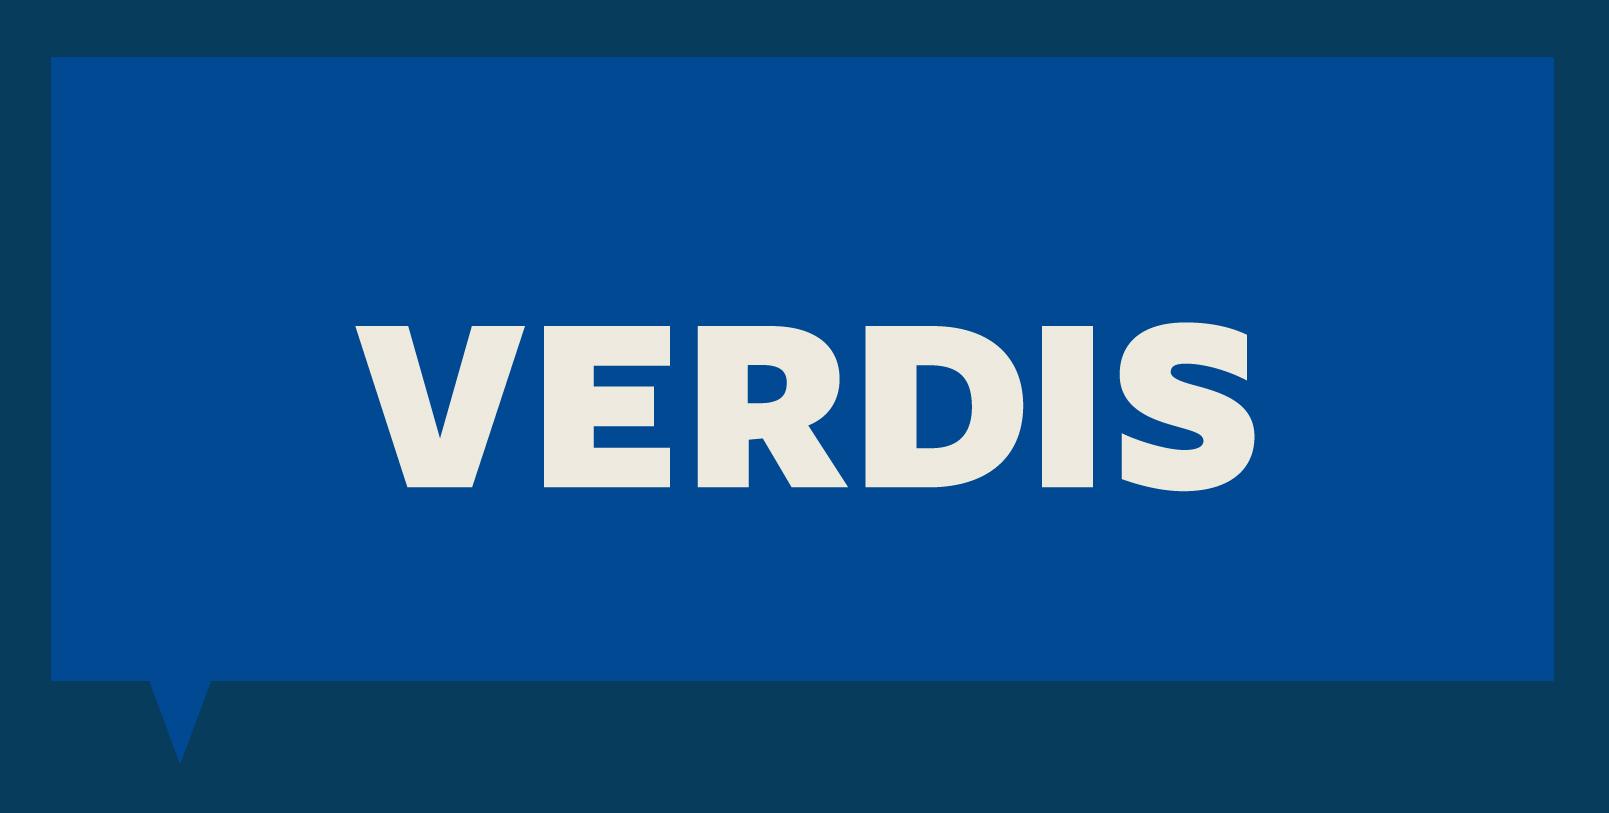 VERDIS logo